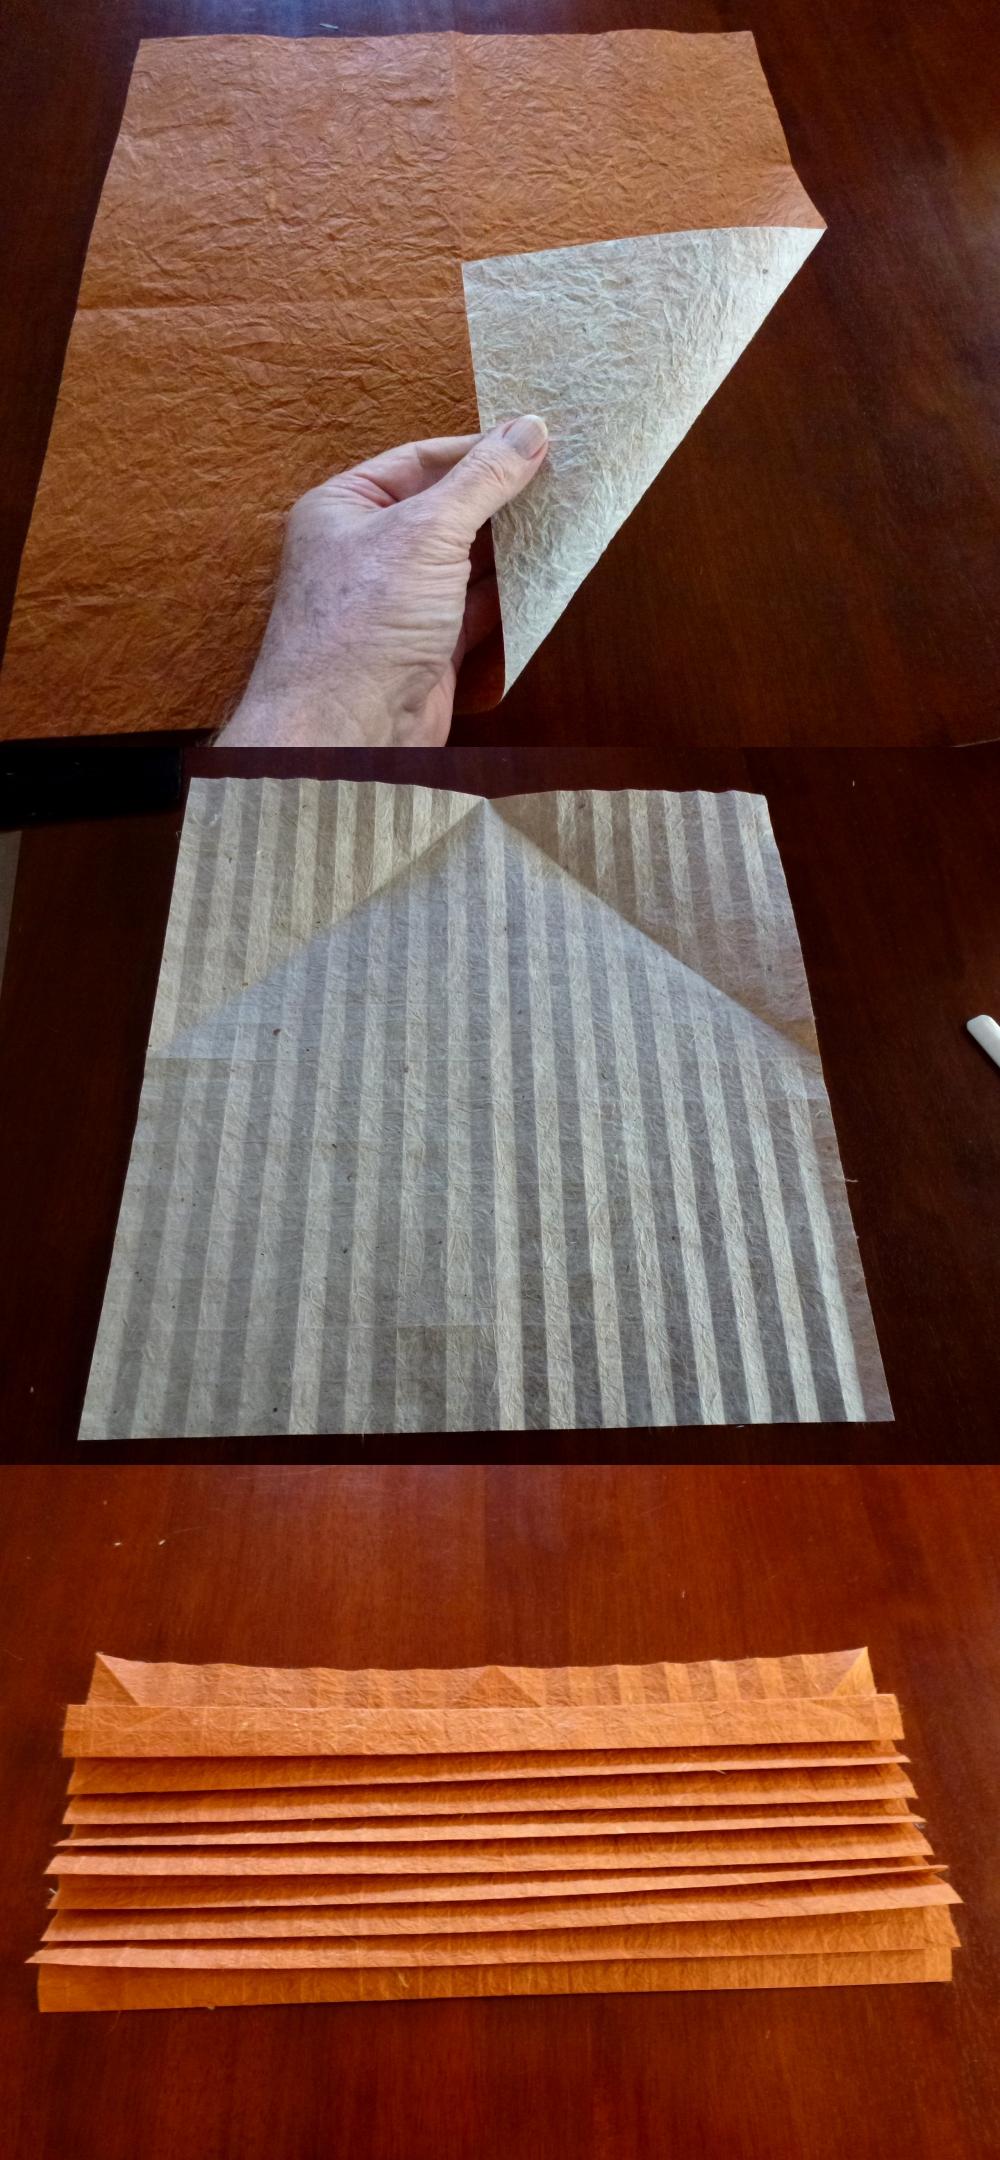 Yudai Imai's hedgehog paper - OrigamiShop's duo Unryu